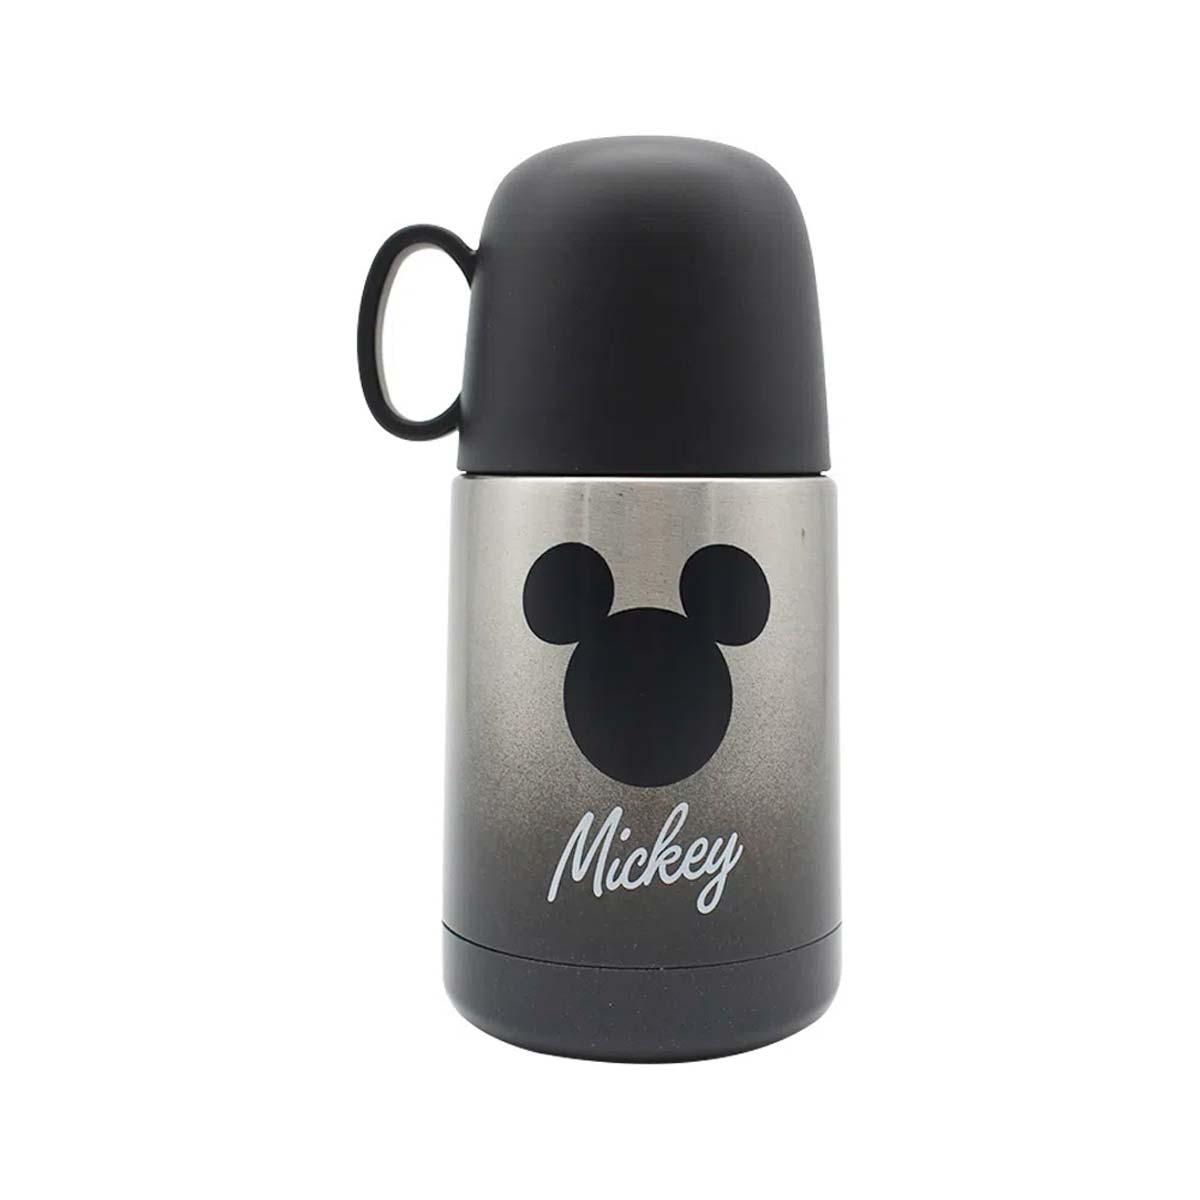 Mini Garrafa com Caneca Mickey Silhueta 210 ml